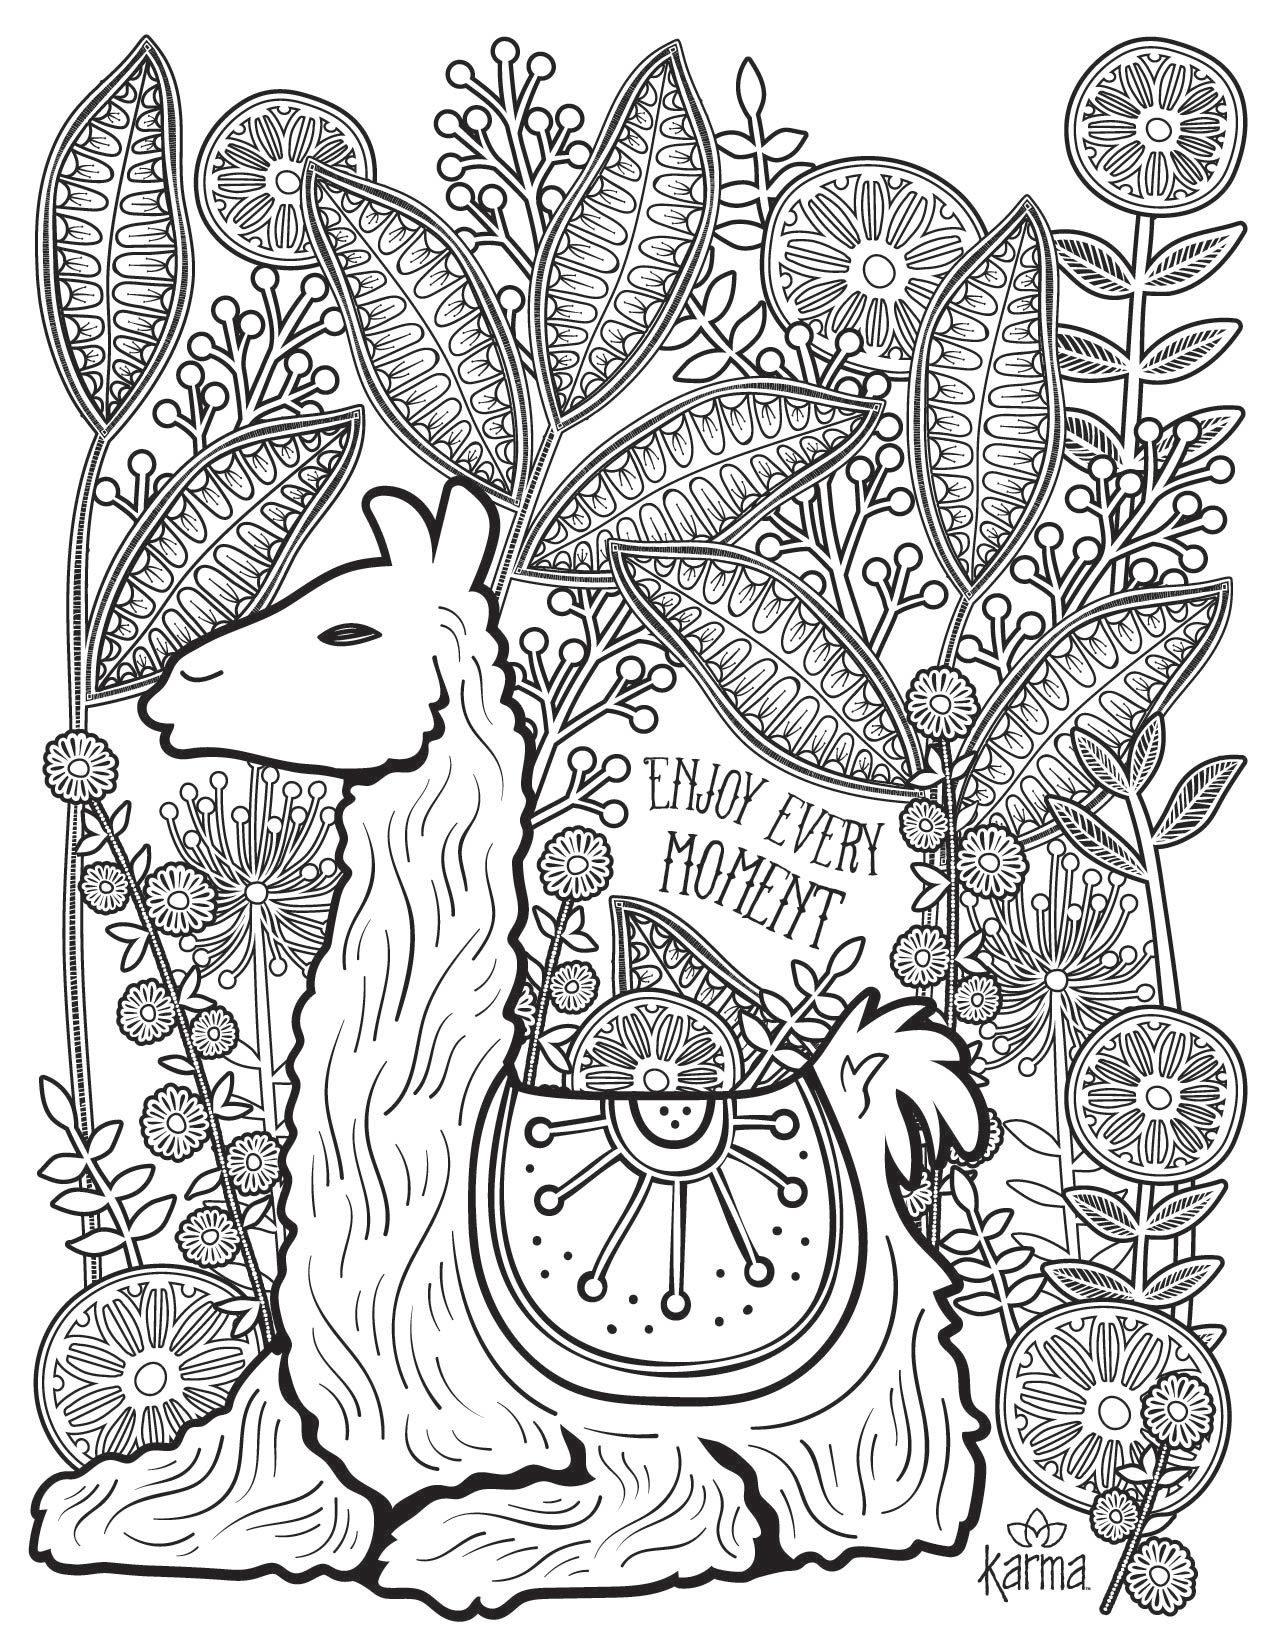 Llamacorn Coloring Pages at GetDrawings | Free download